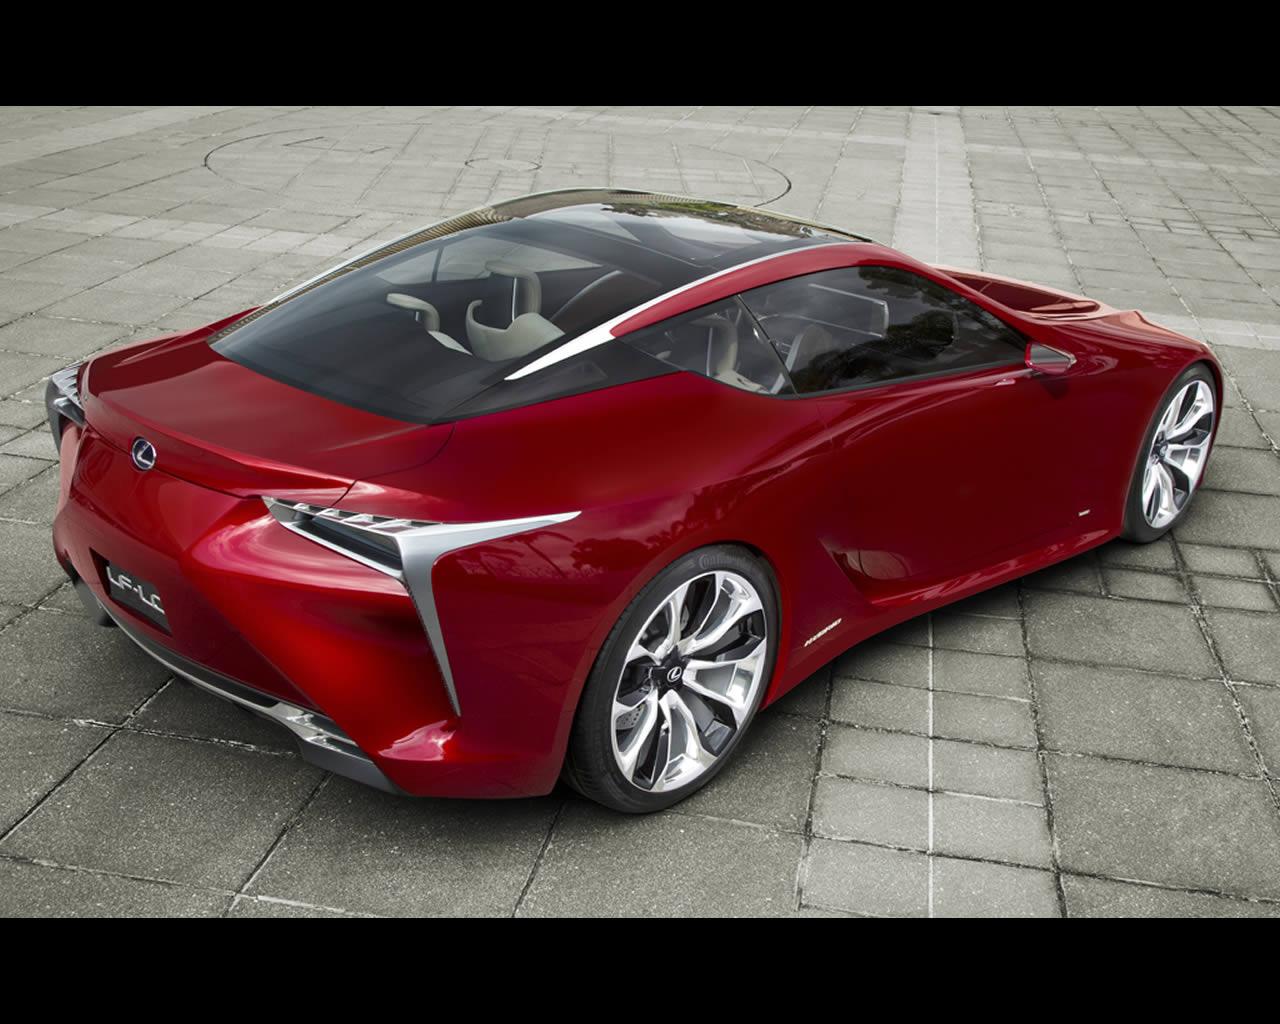 lexus lf lc hybrid 2 2 sport coupe design concept 2012. Black Bedroom Furniture Sets. Home Design Ideas